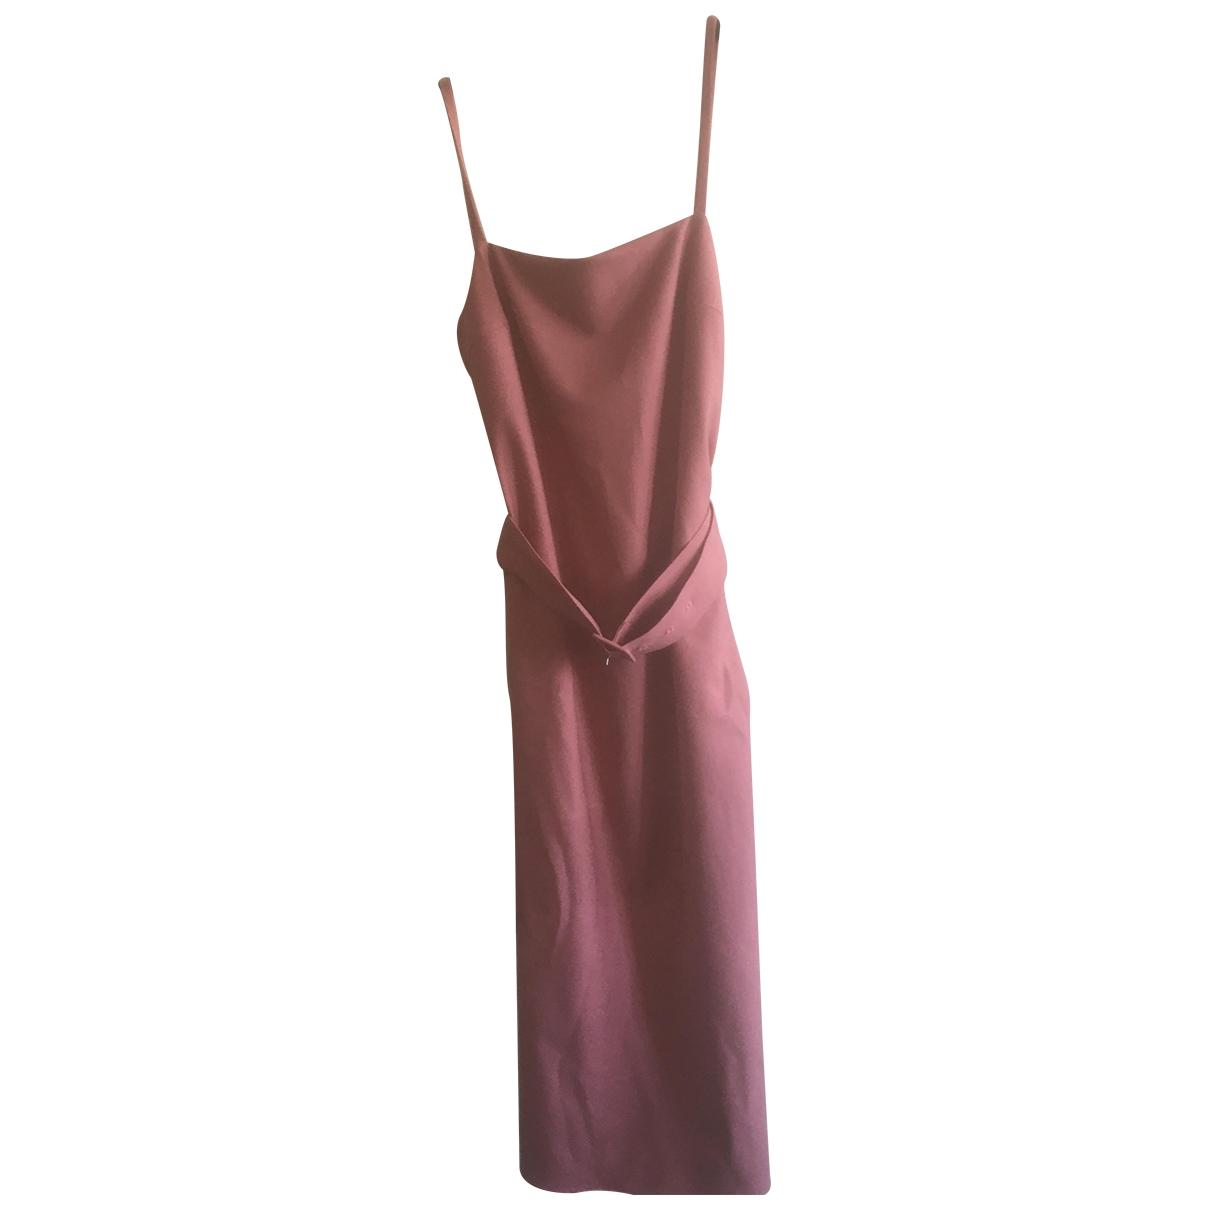 Rokh \N Pink Linen dress for Women 34 FR